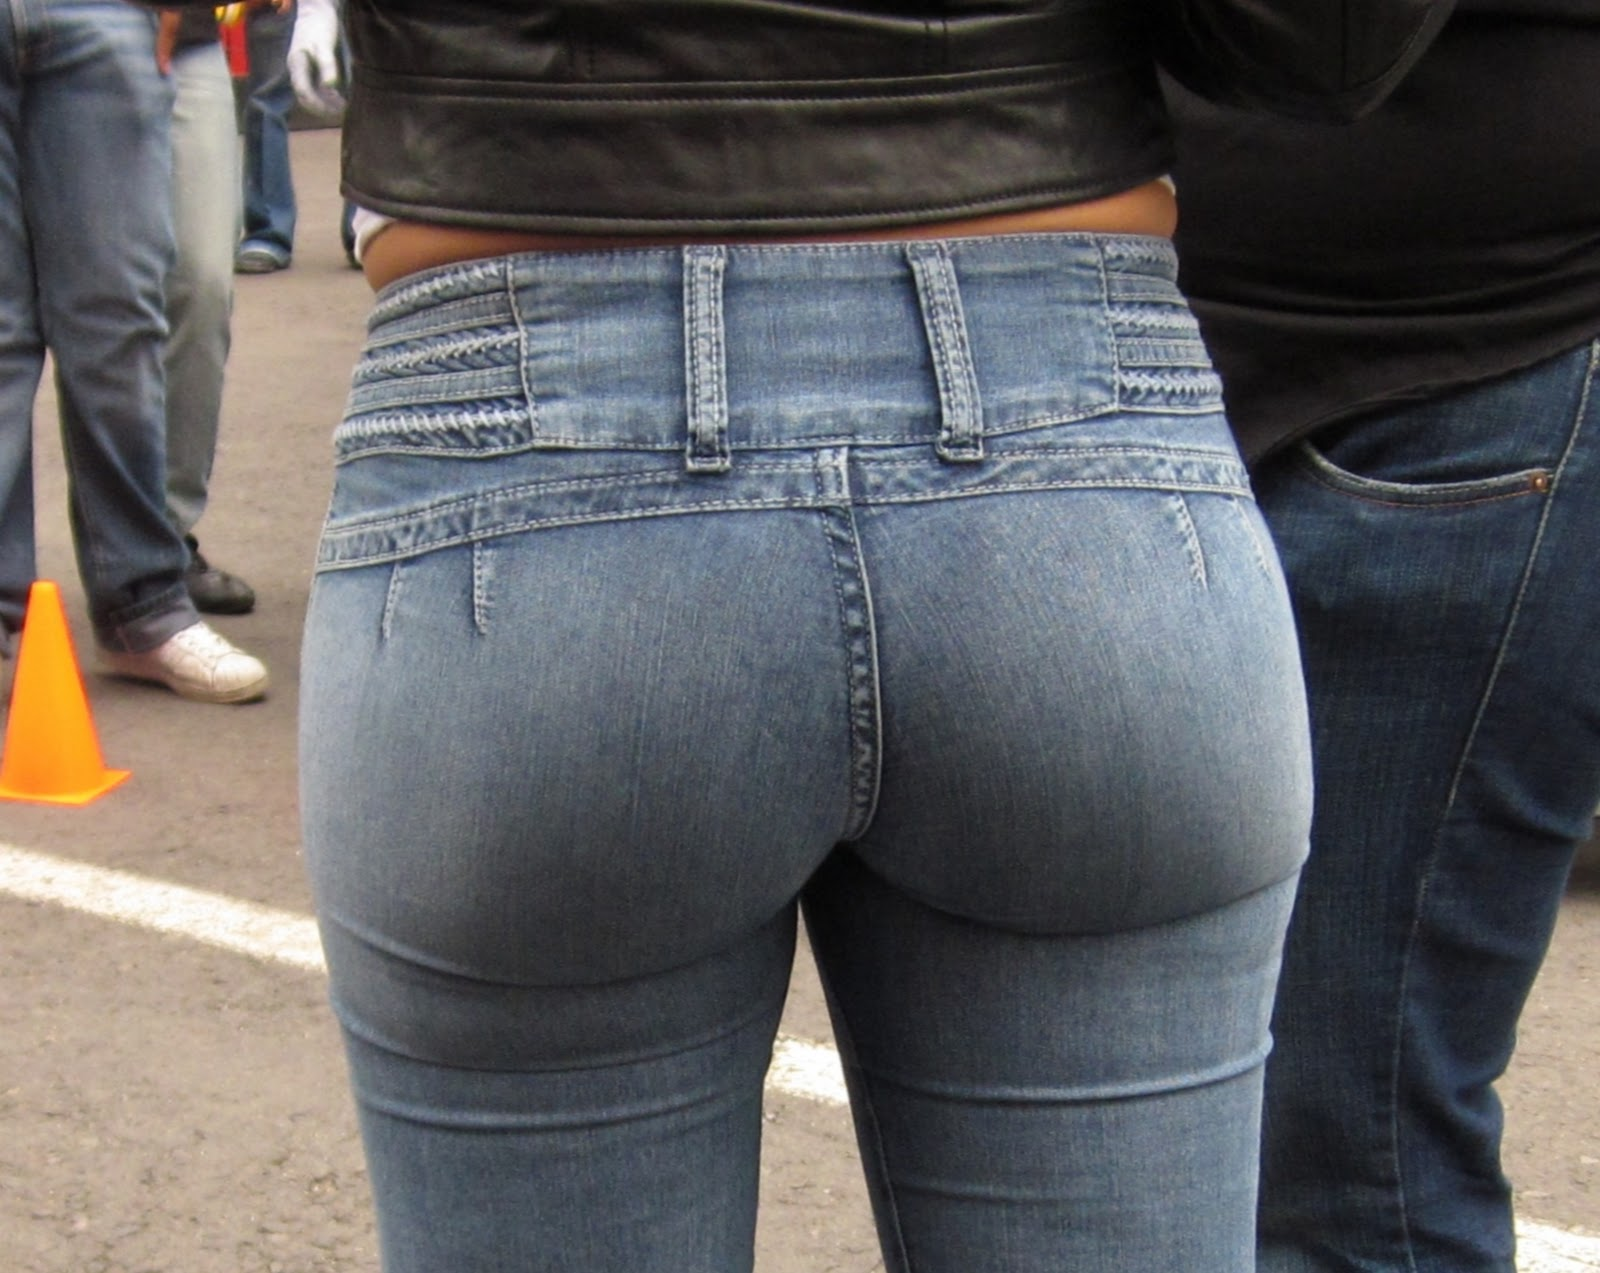 tight pant ass jpg 422x640